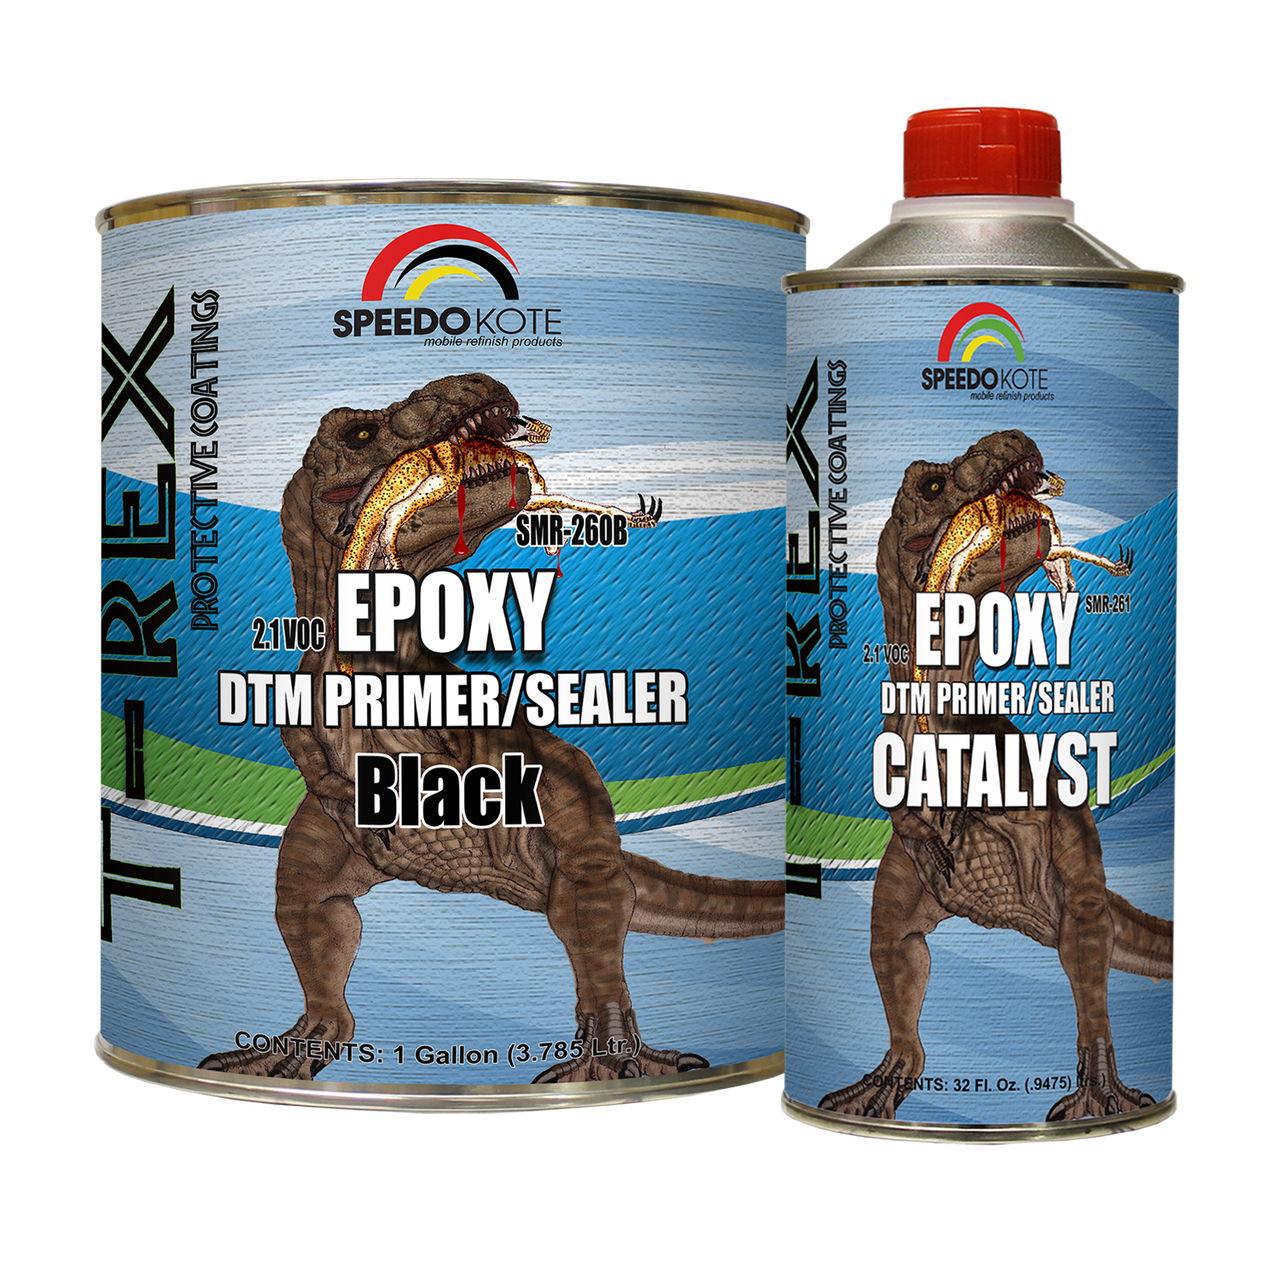 SMR-260B/261  2.1 VOC Epoxy DTM Primer/Sealer Black